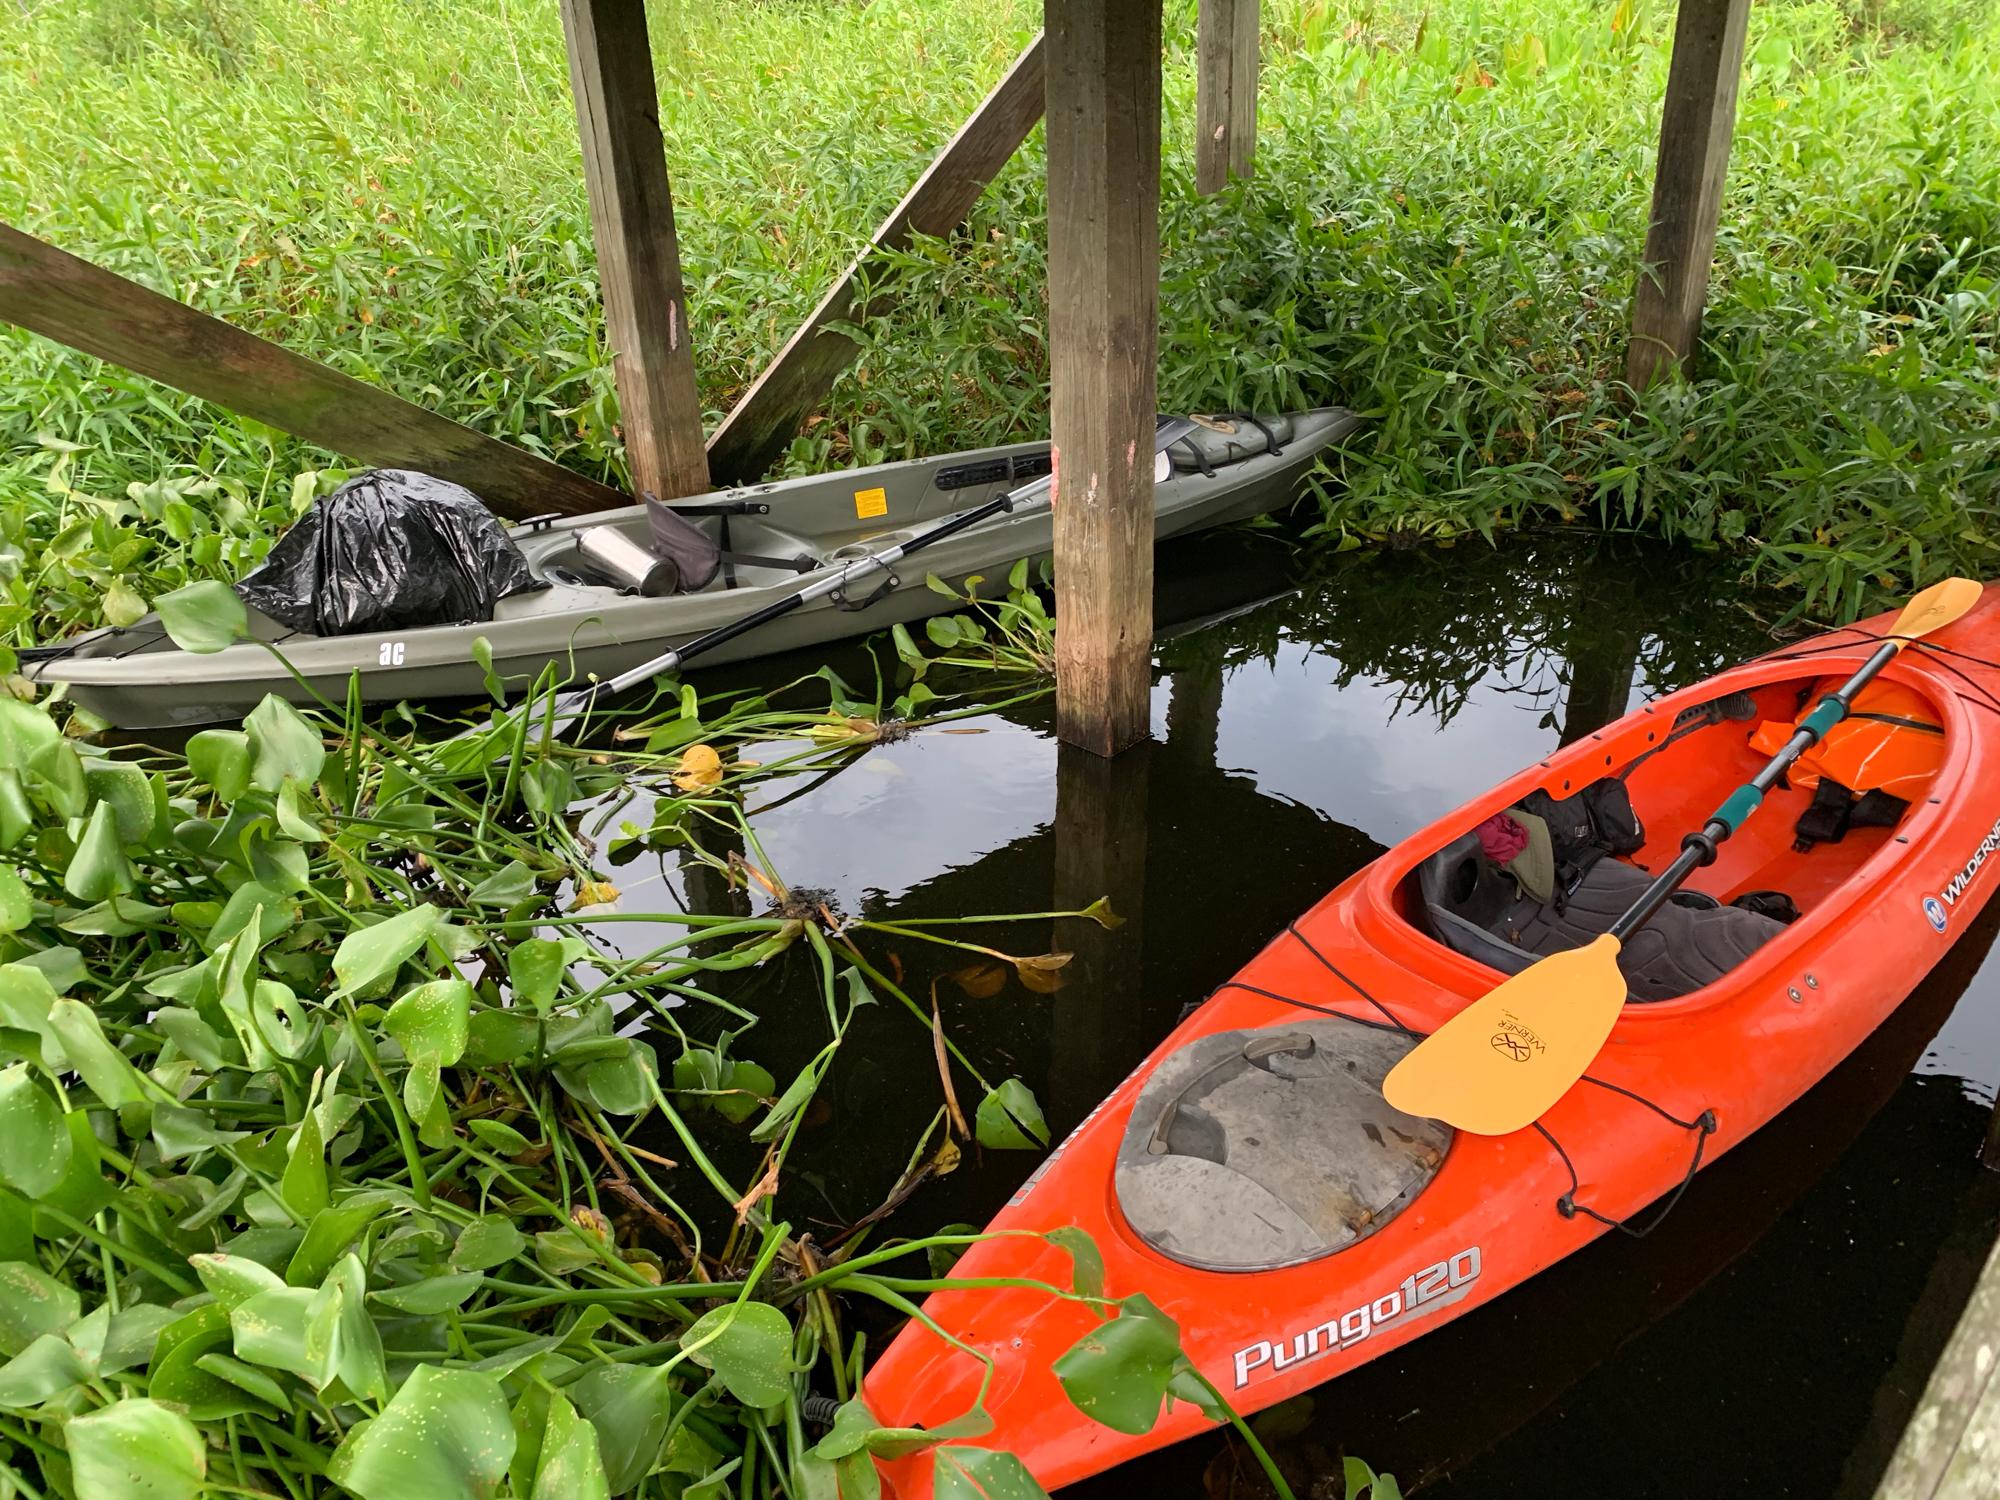 Our kayaks enclosed beneath the La Chua Trail observation platform.